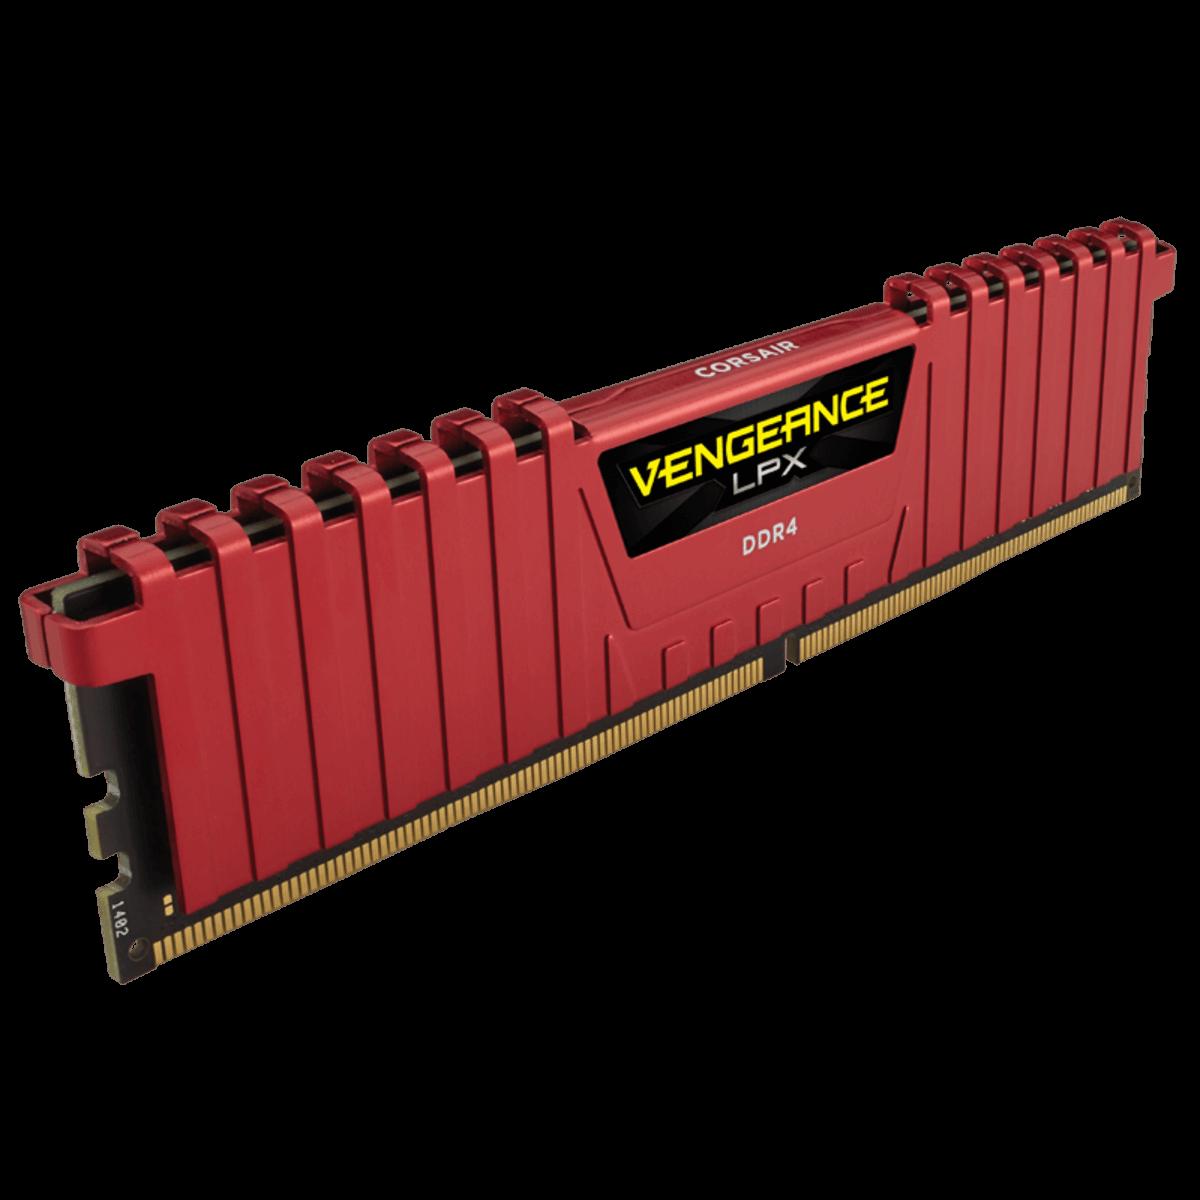 Kit Upgrade Gamer B360M D3H + Processador i3 8100 + 8GB DDR4